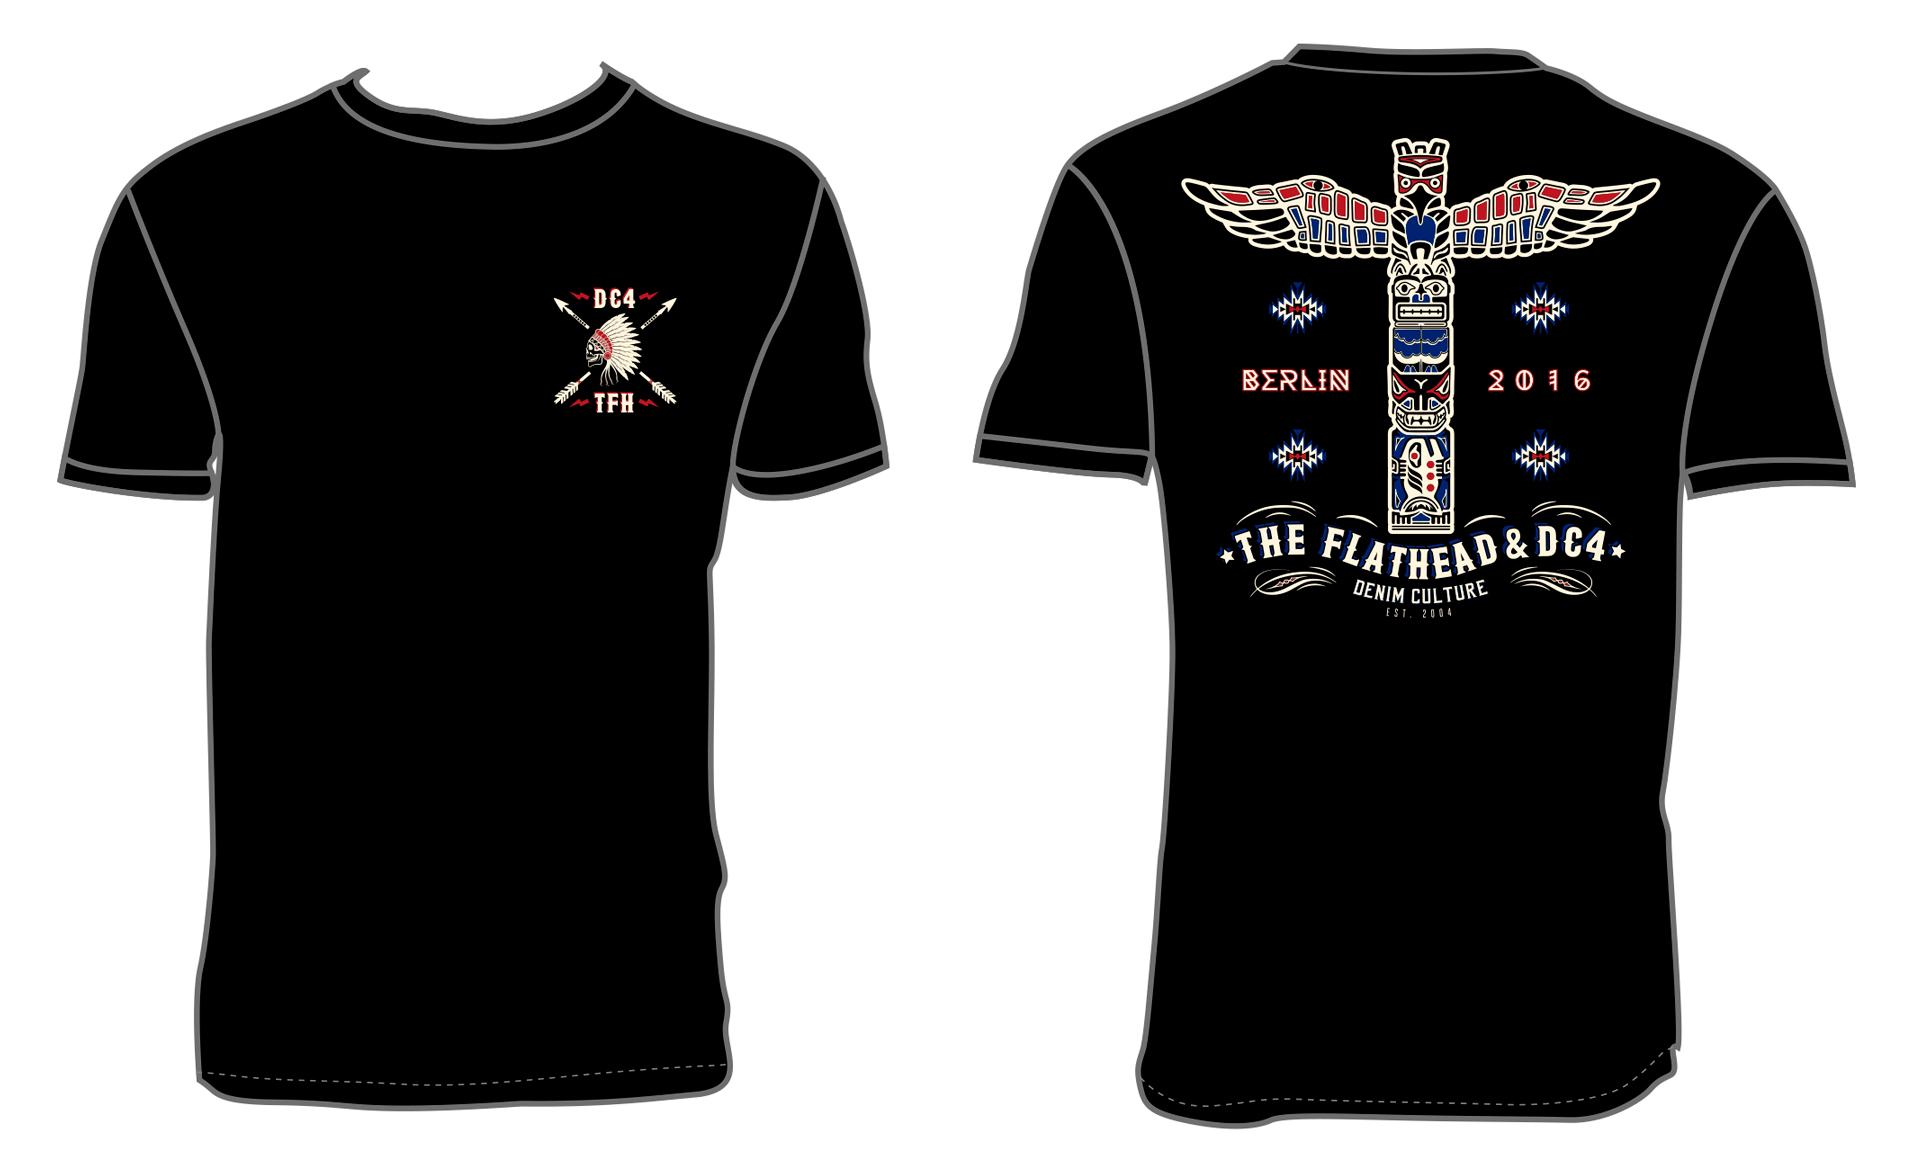 DC4 & THE FLAT HEAD T-Shirt